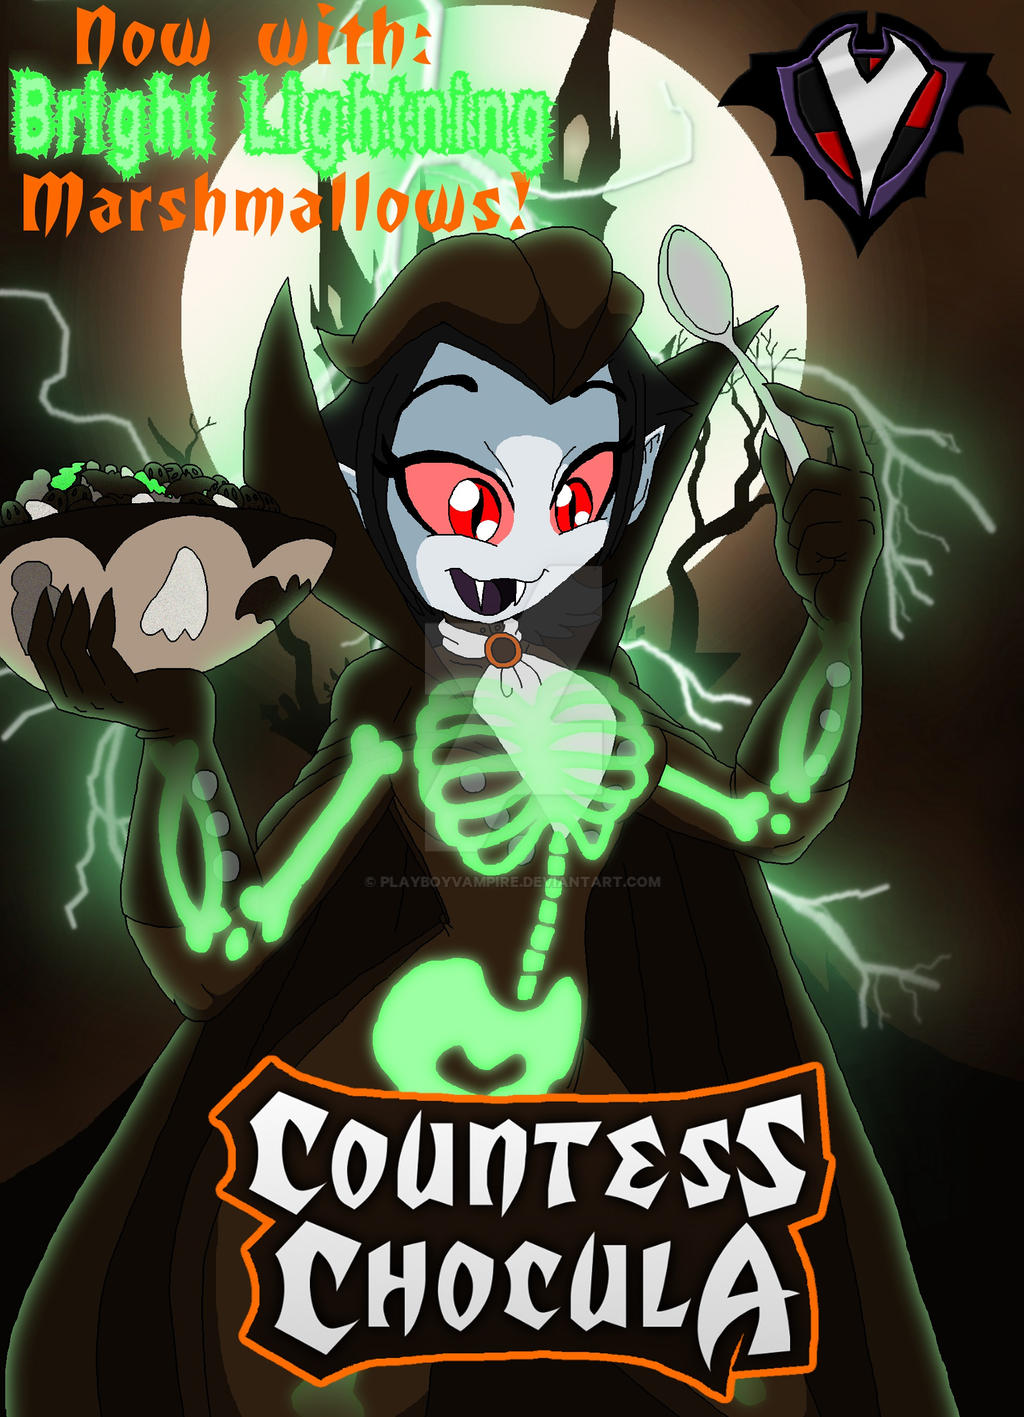 Countess Chocula - Glow-in-the-Dark by PlayboyVampire